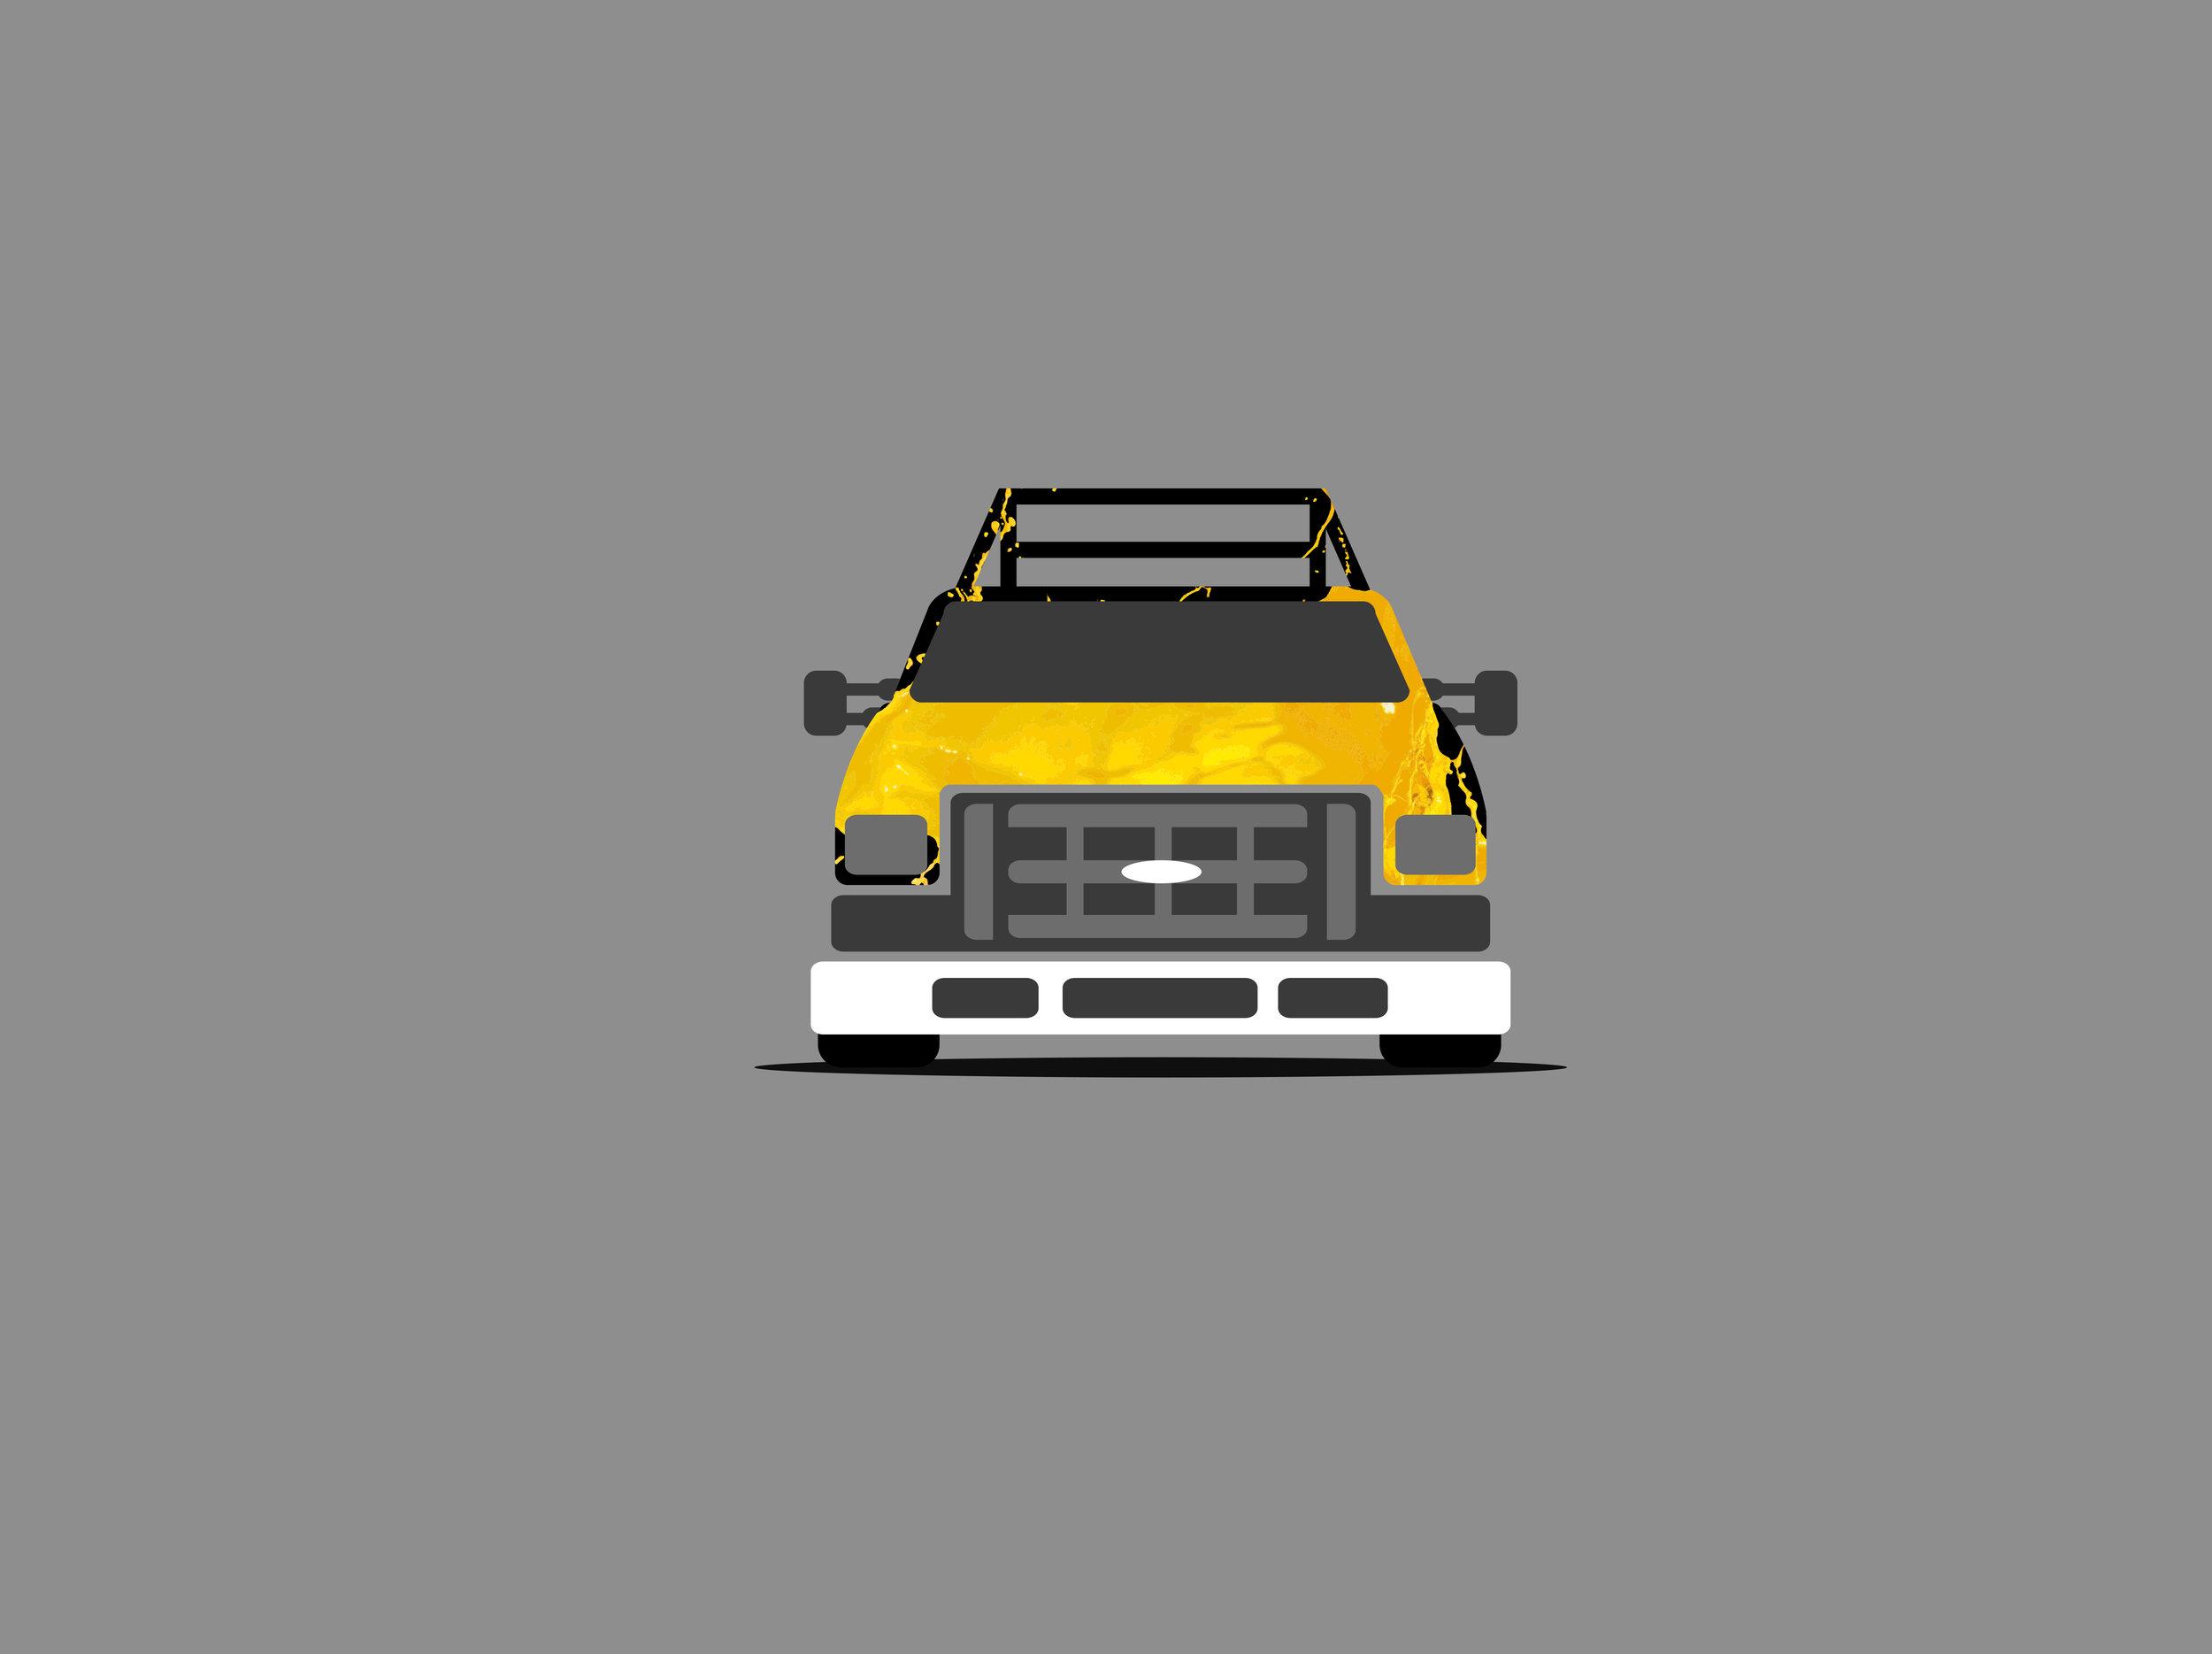 truck_front.jpg